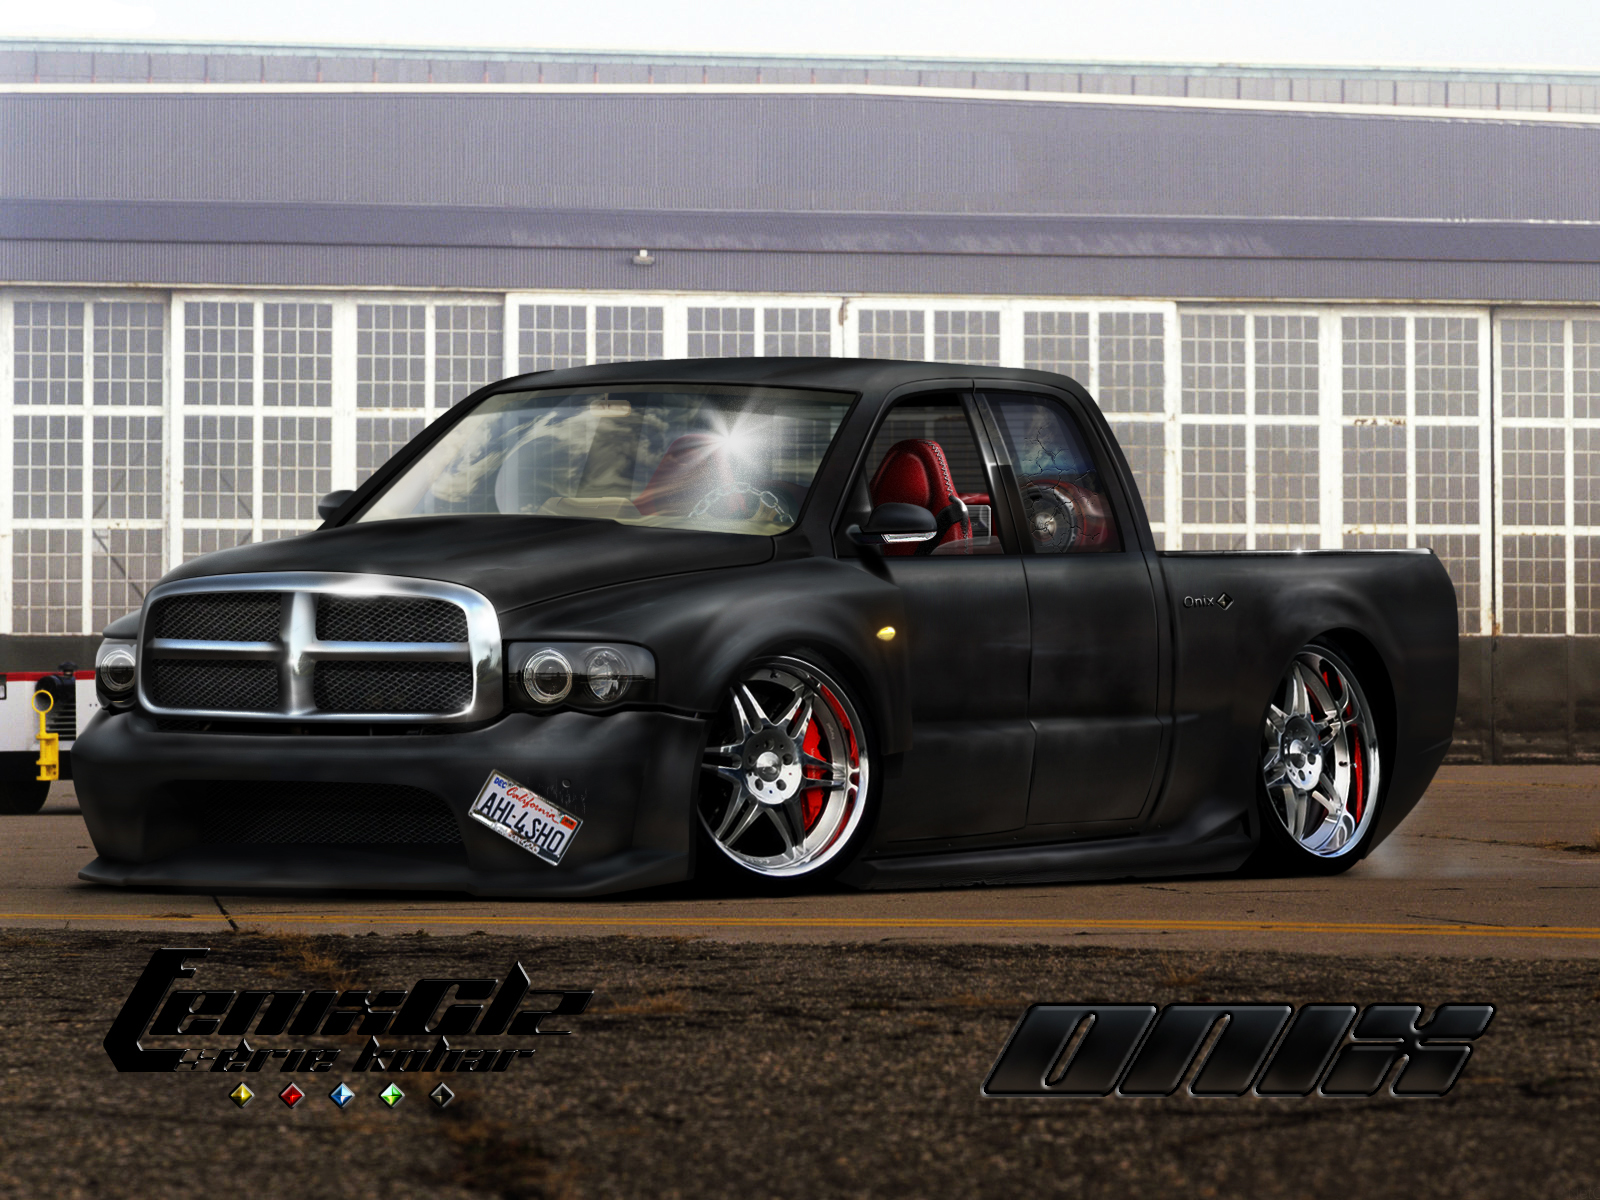 Dodge Ram Onix By Fenixclz013 On Deviantart